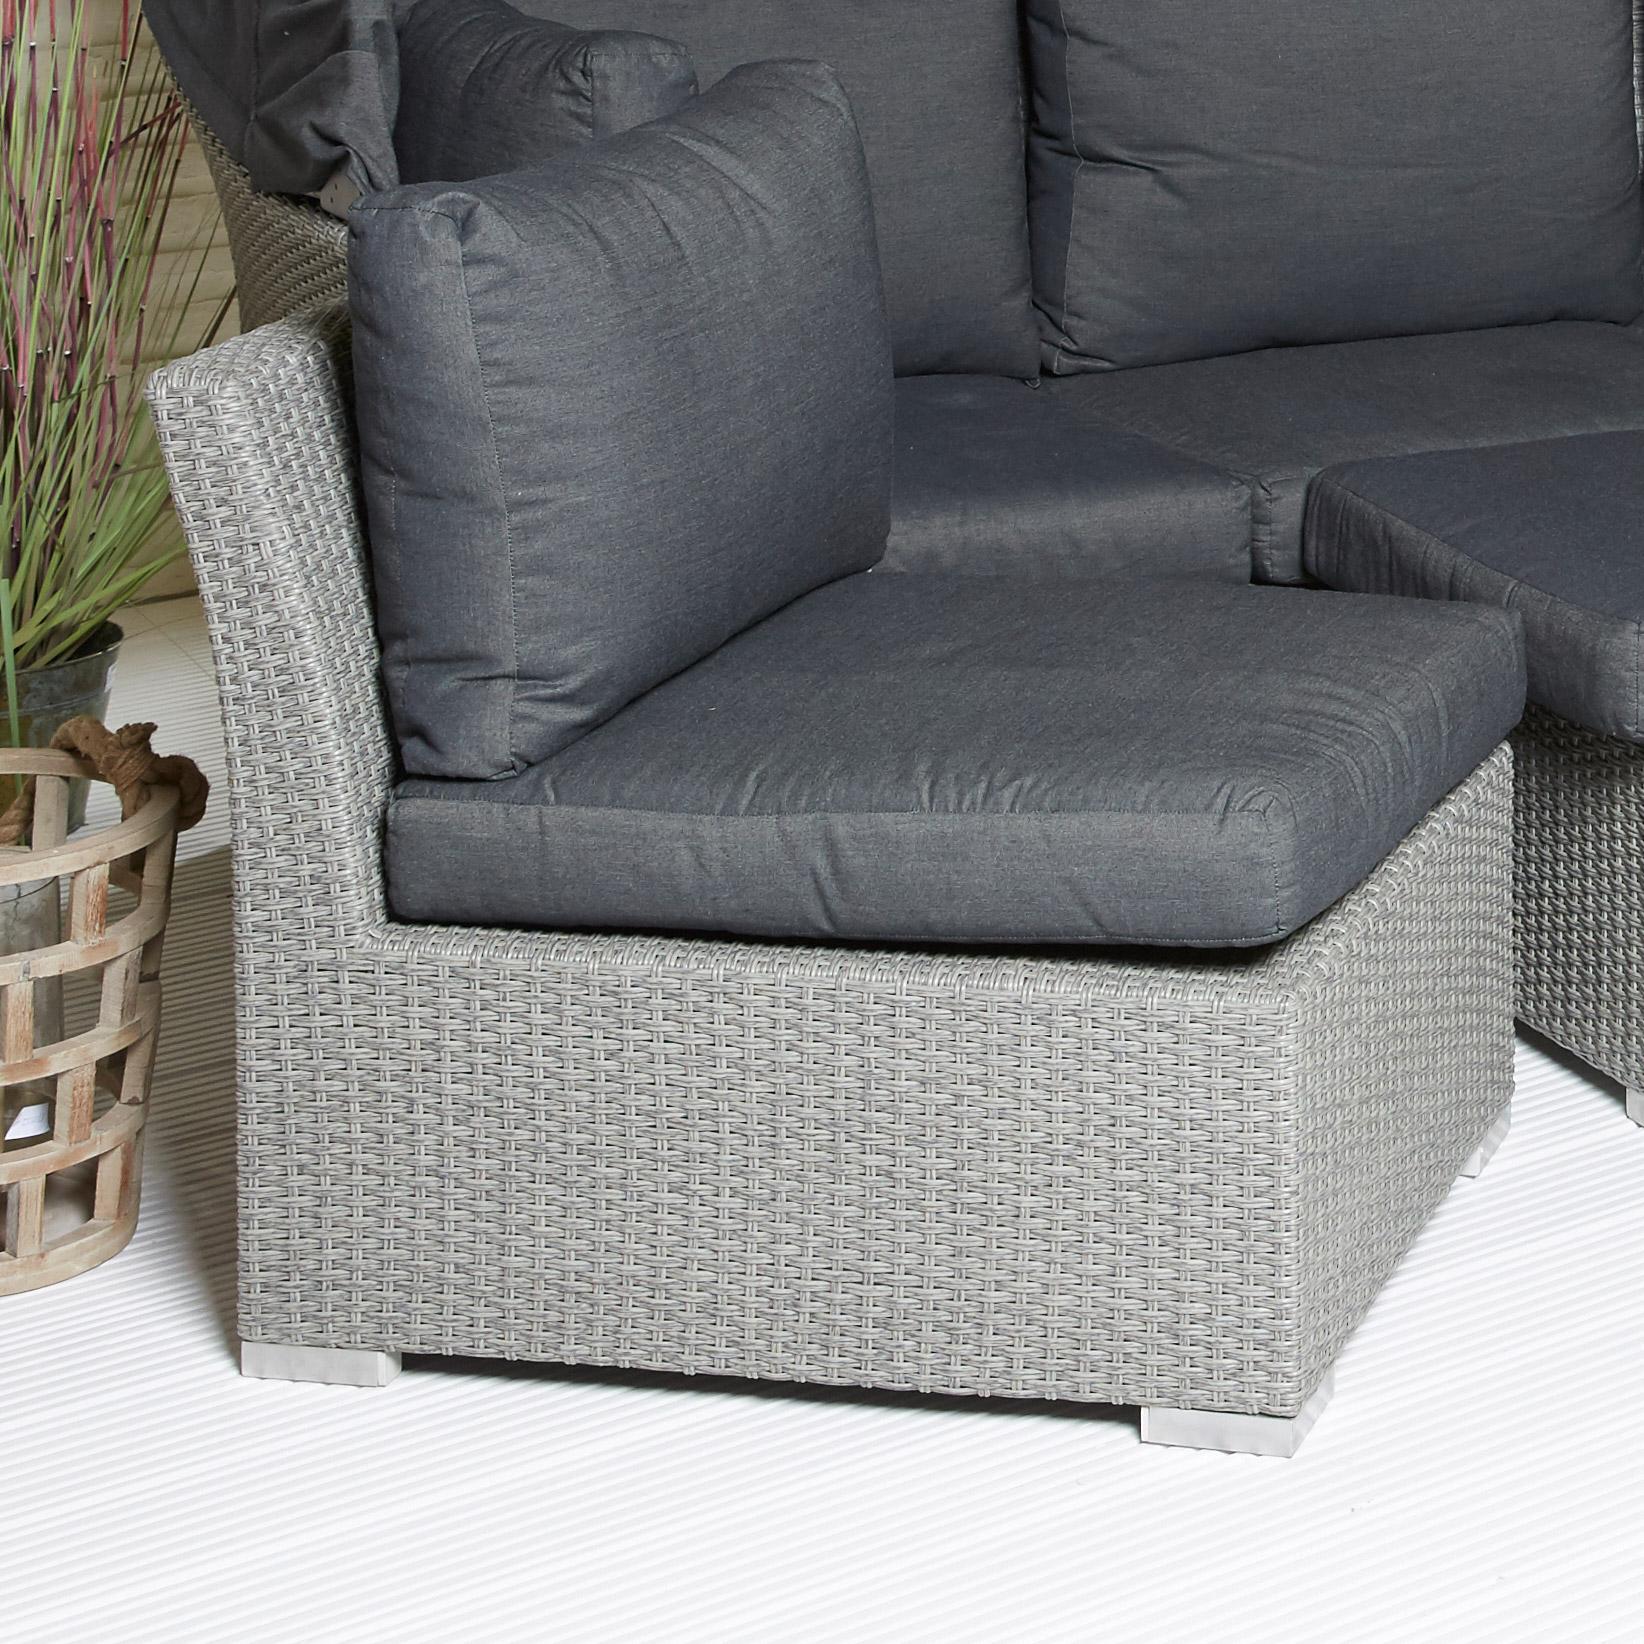 sonneninsel gartenset grau garten lounge garnitur sunbed. Black Bedroom Furniture Sets. Home Design Ideas